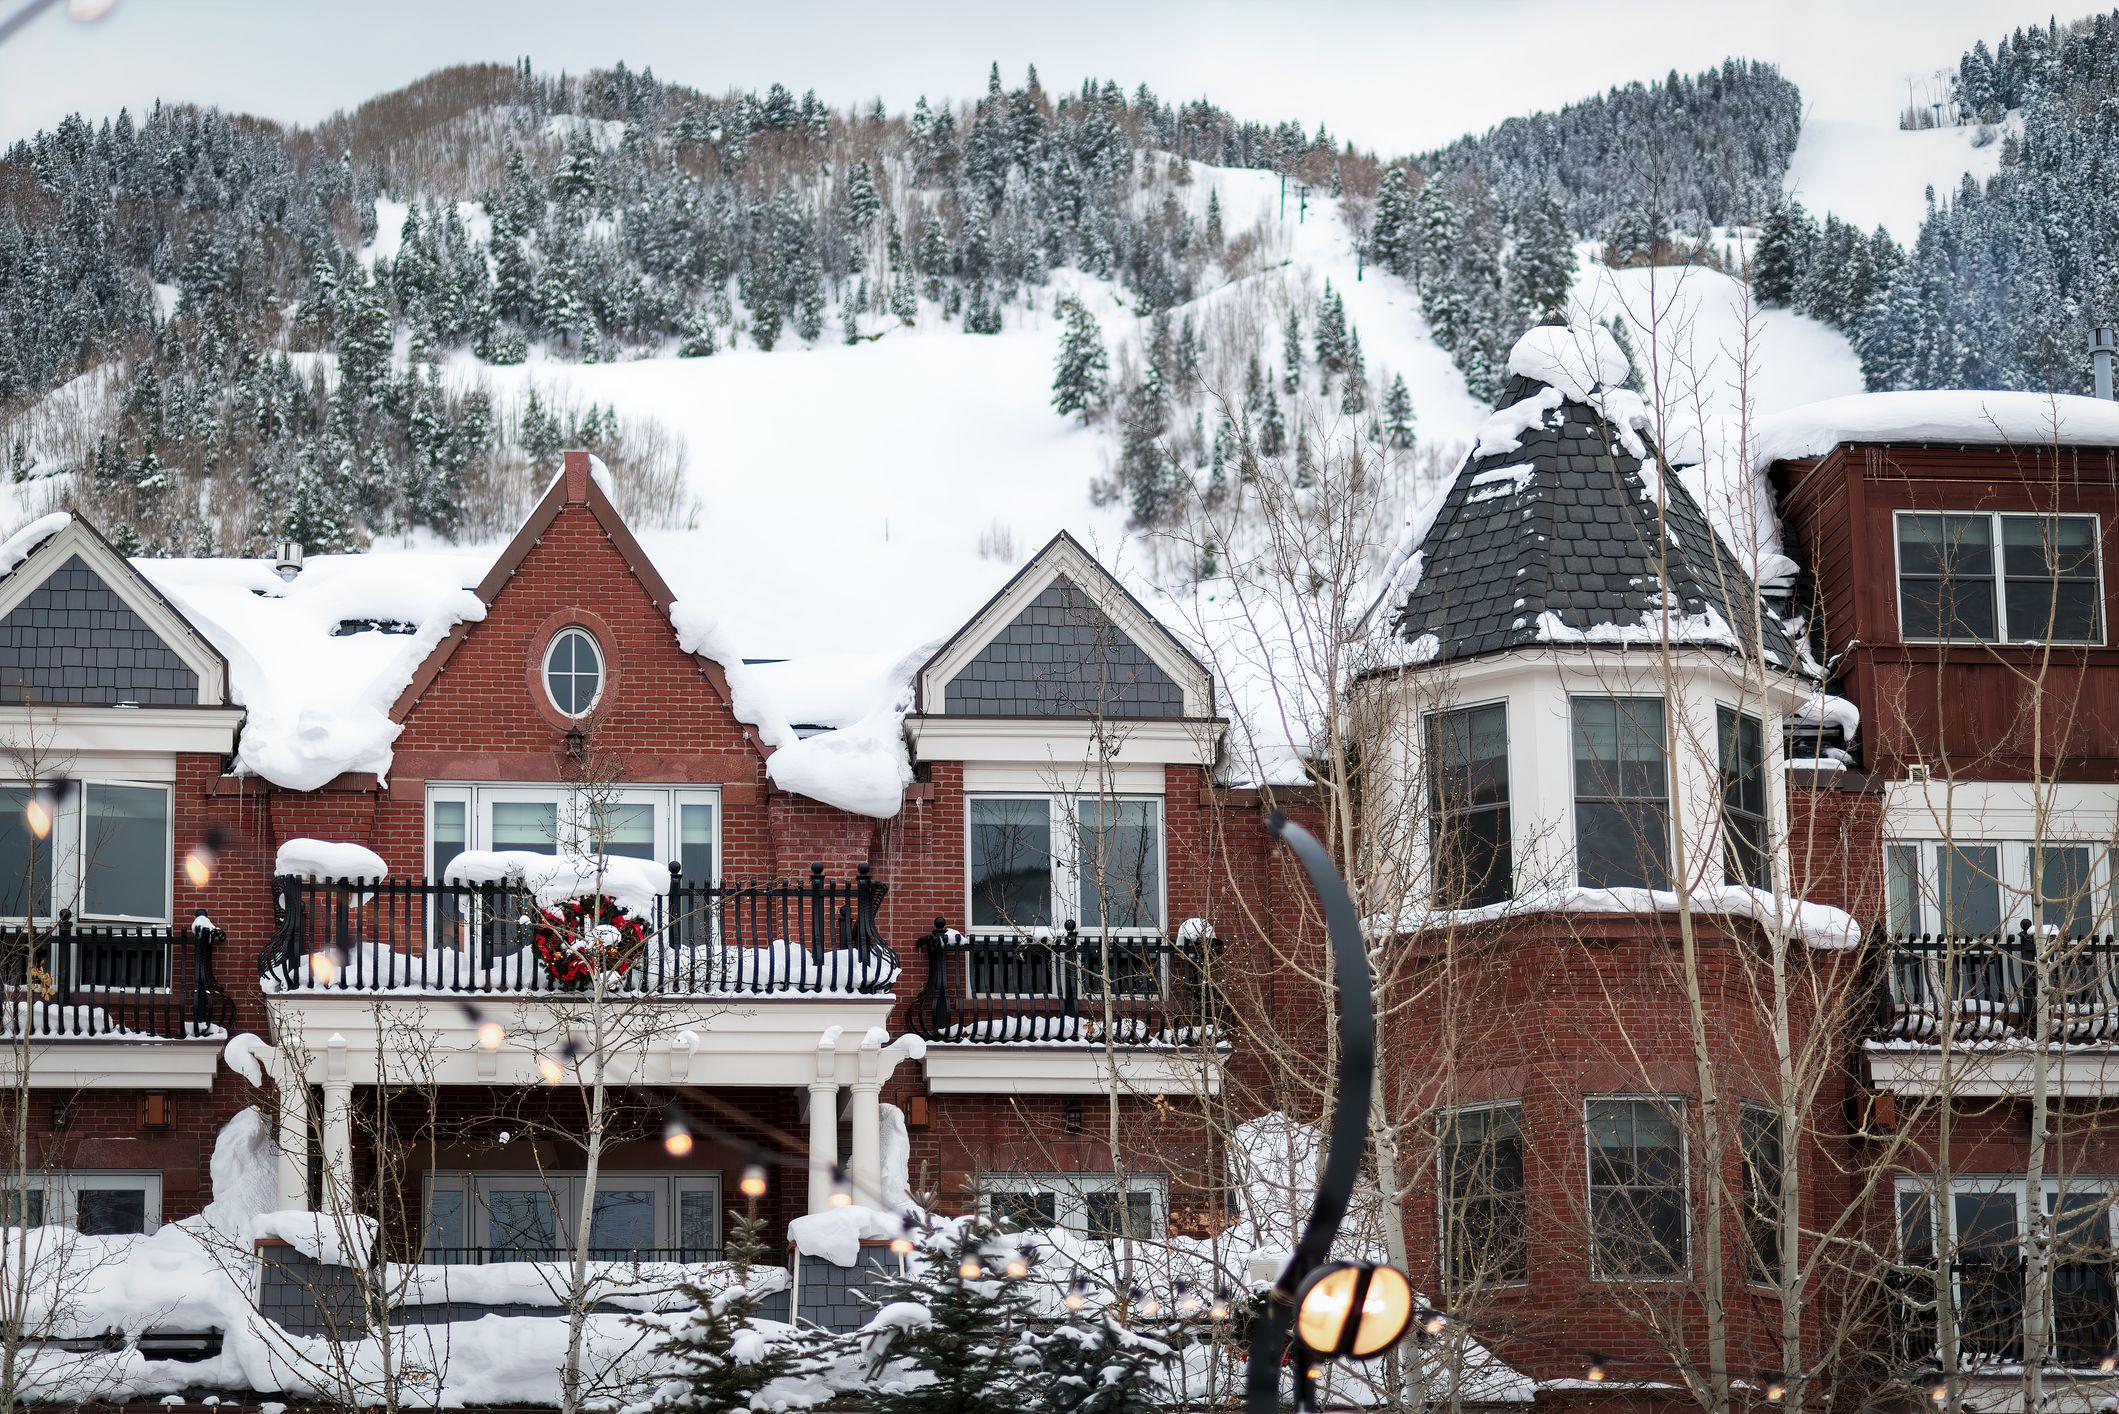 Aspen Colorado vinter sentrum